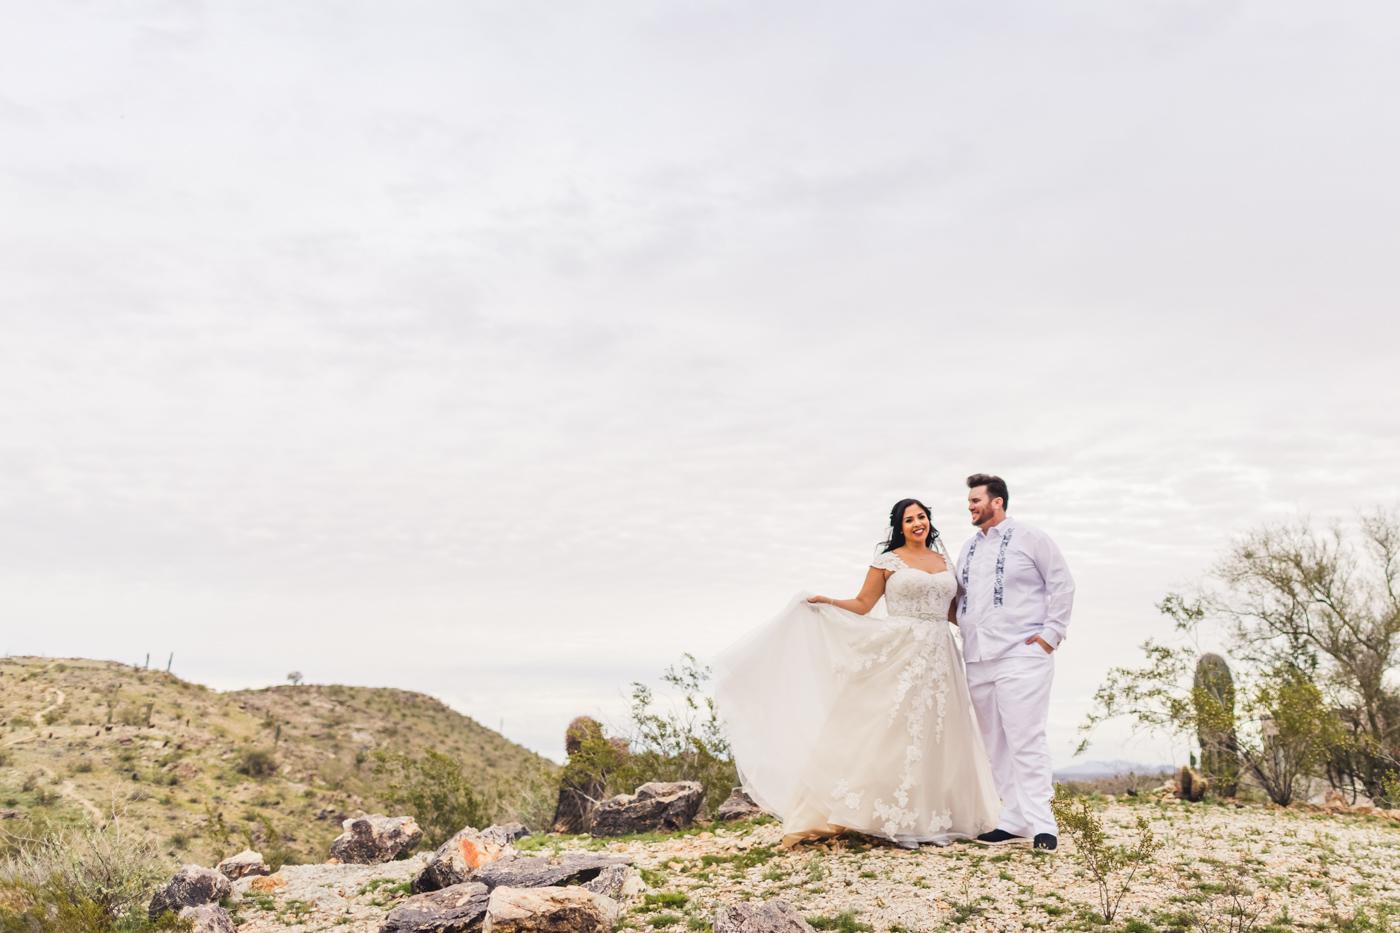 bride-and-groom-desert-wedding-portrait-session